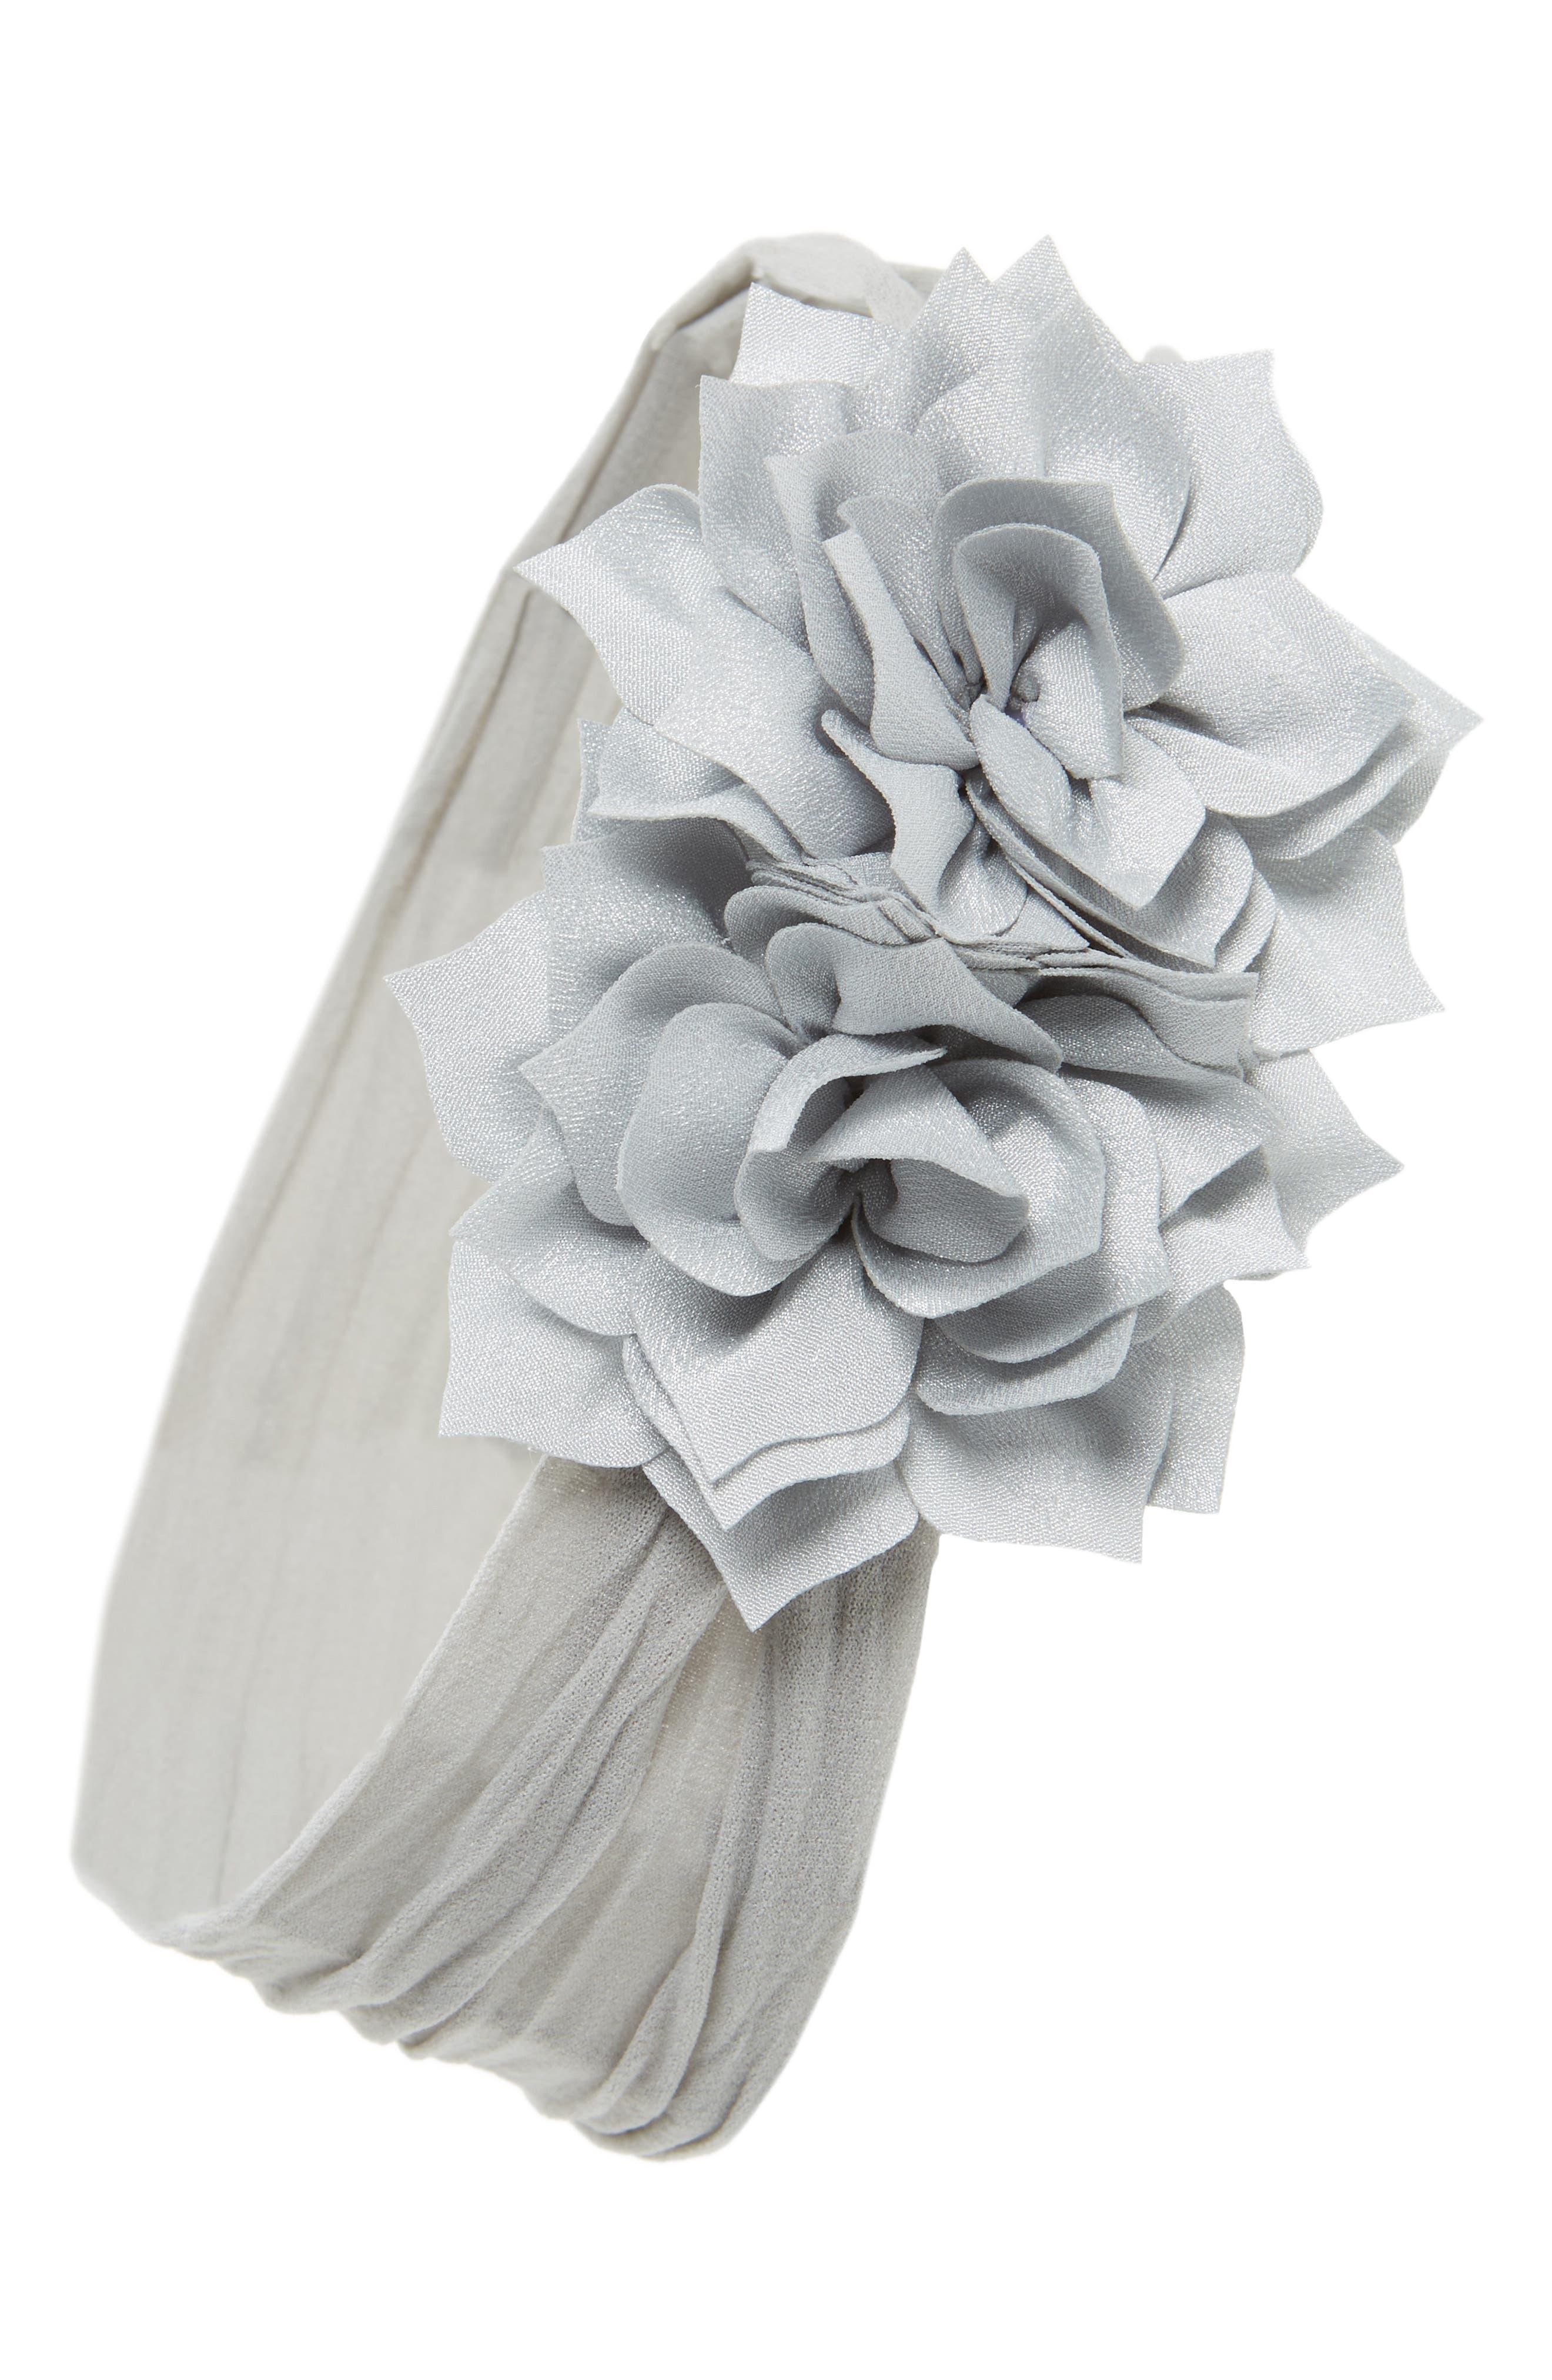 Alternate Image 1 Selected - Baby Bling Holiday Poinsettia Flower Headband (Baby Girls)